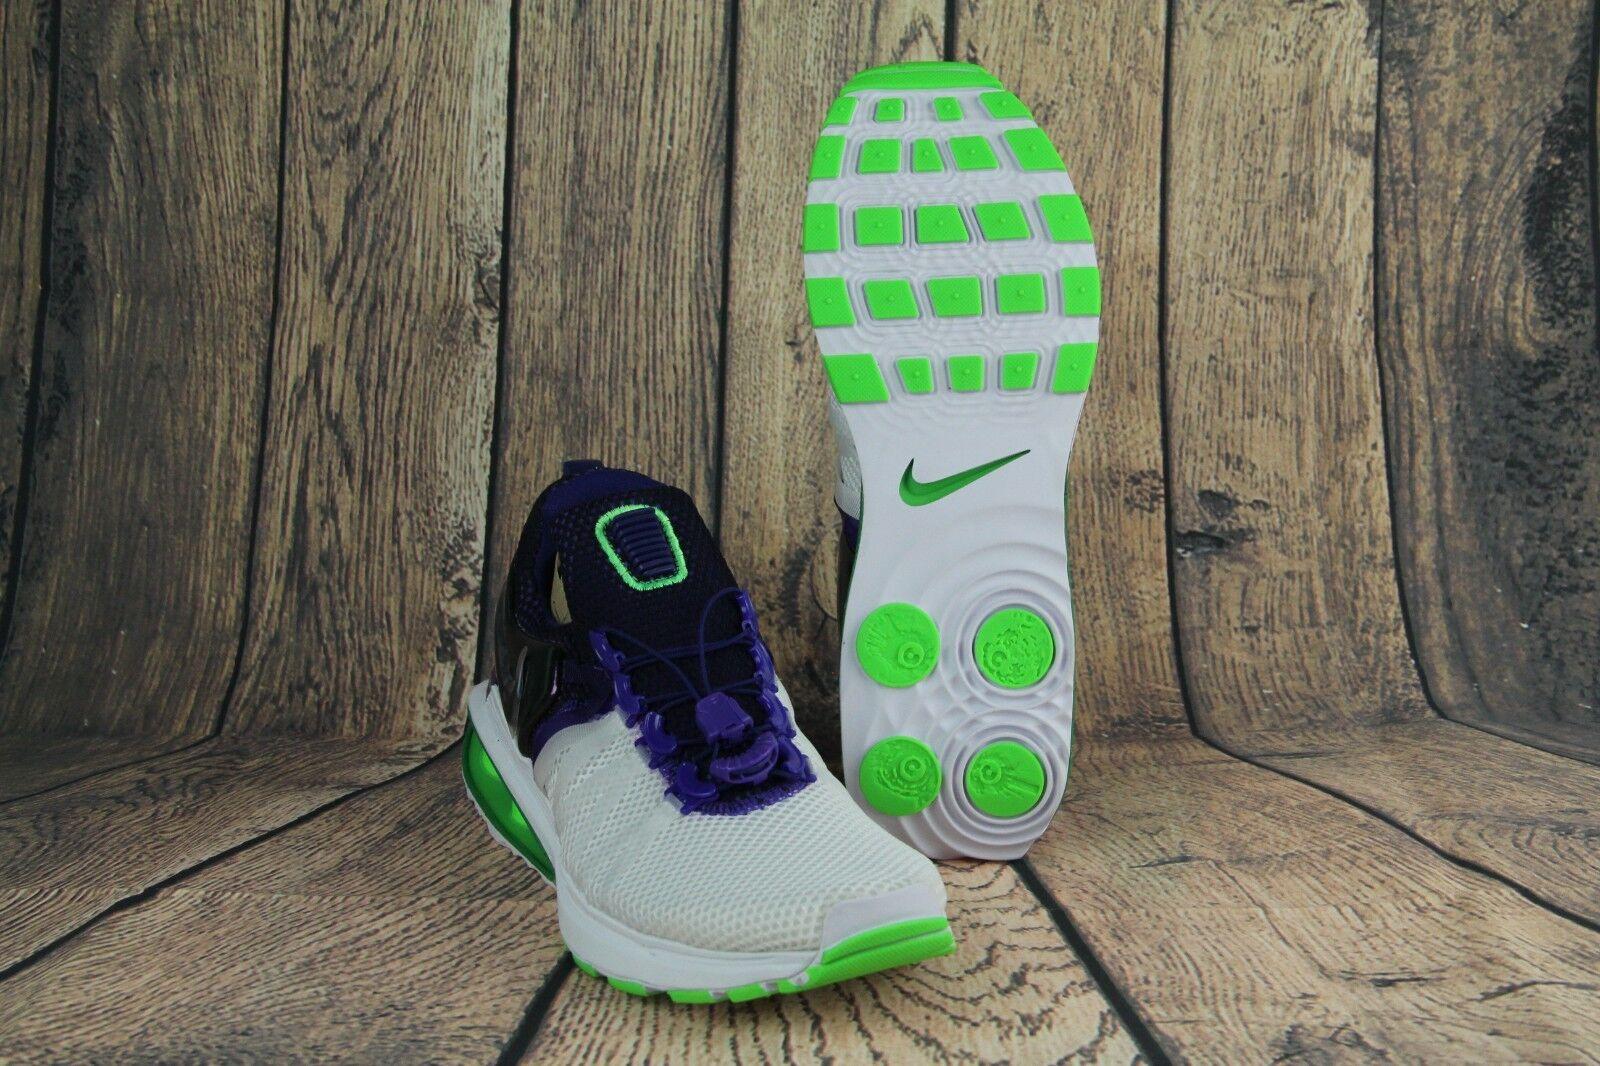 Nike shox schwere turnschuhe, weiße fusion violet violet violet wut grüne aq8554-105 frauen sz eba374